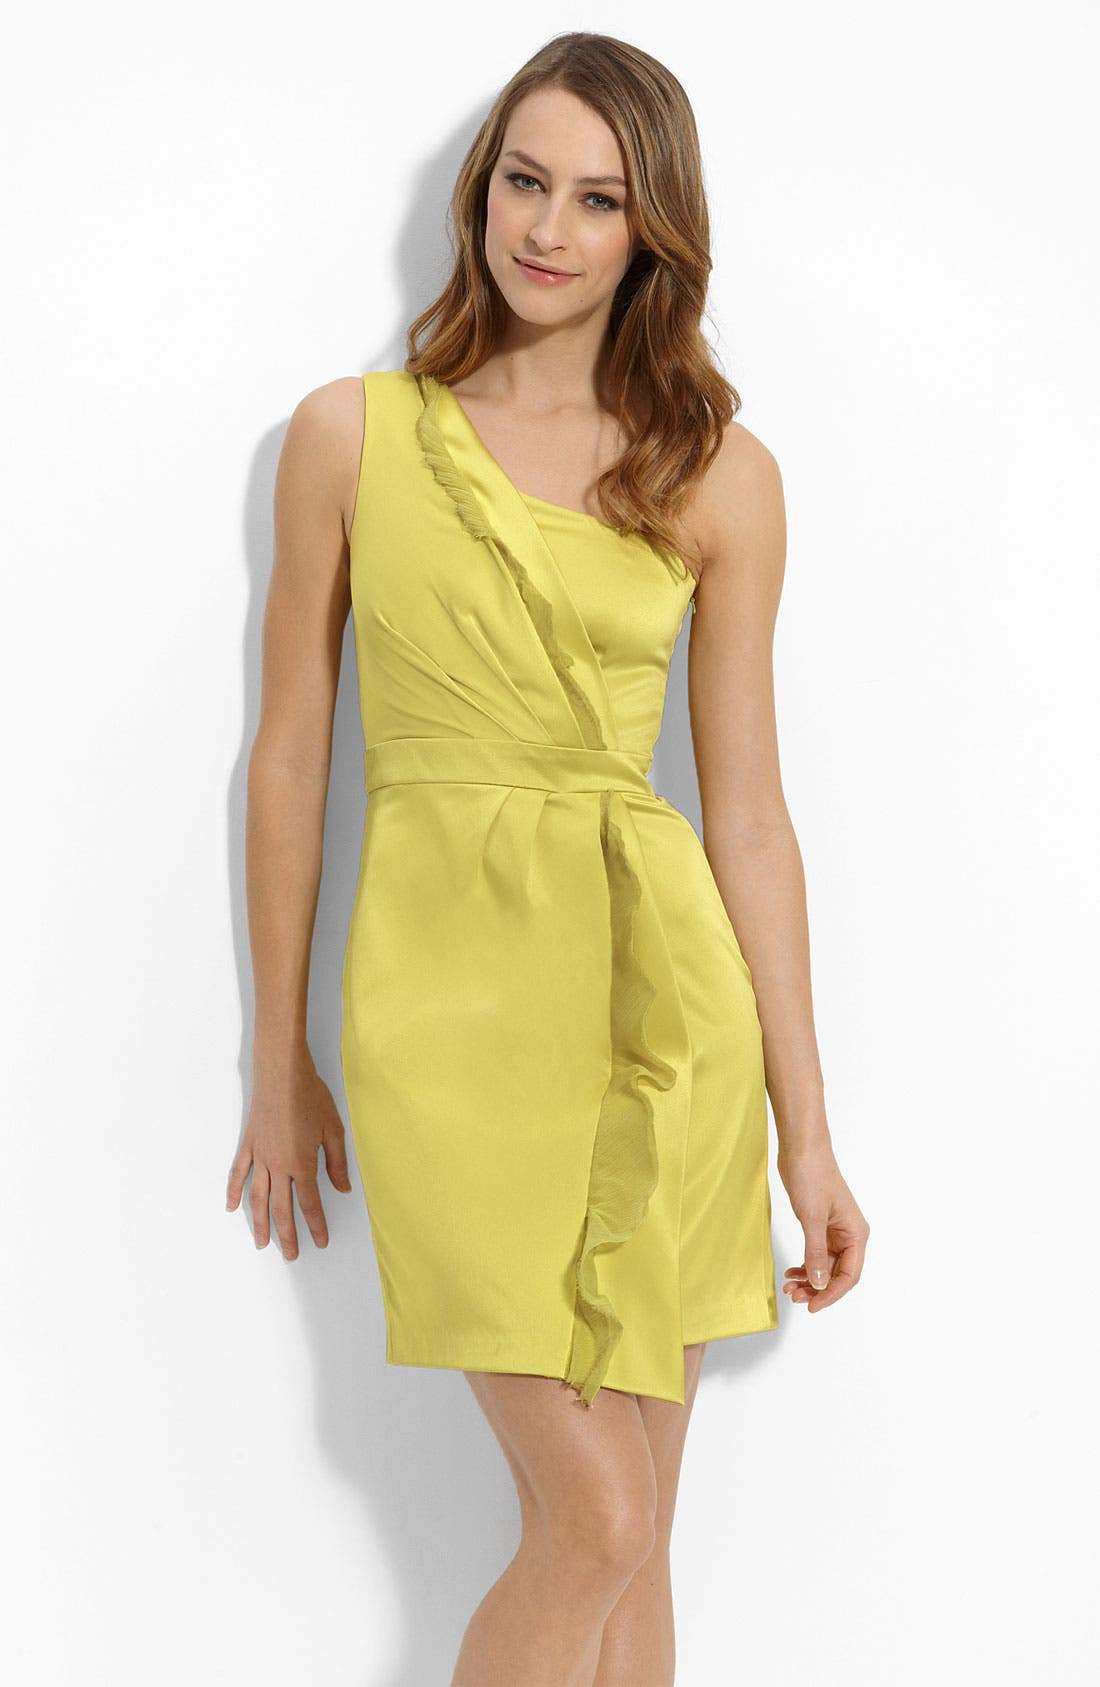 Alternate Image 1 Selected - Max & Cleo One Shoulder Stretch Satin Dress